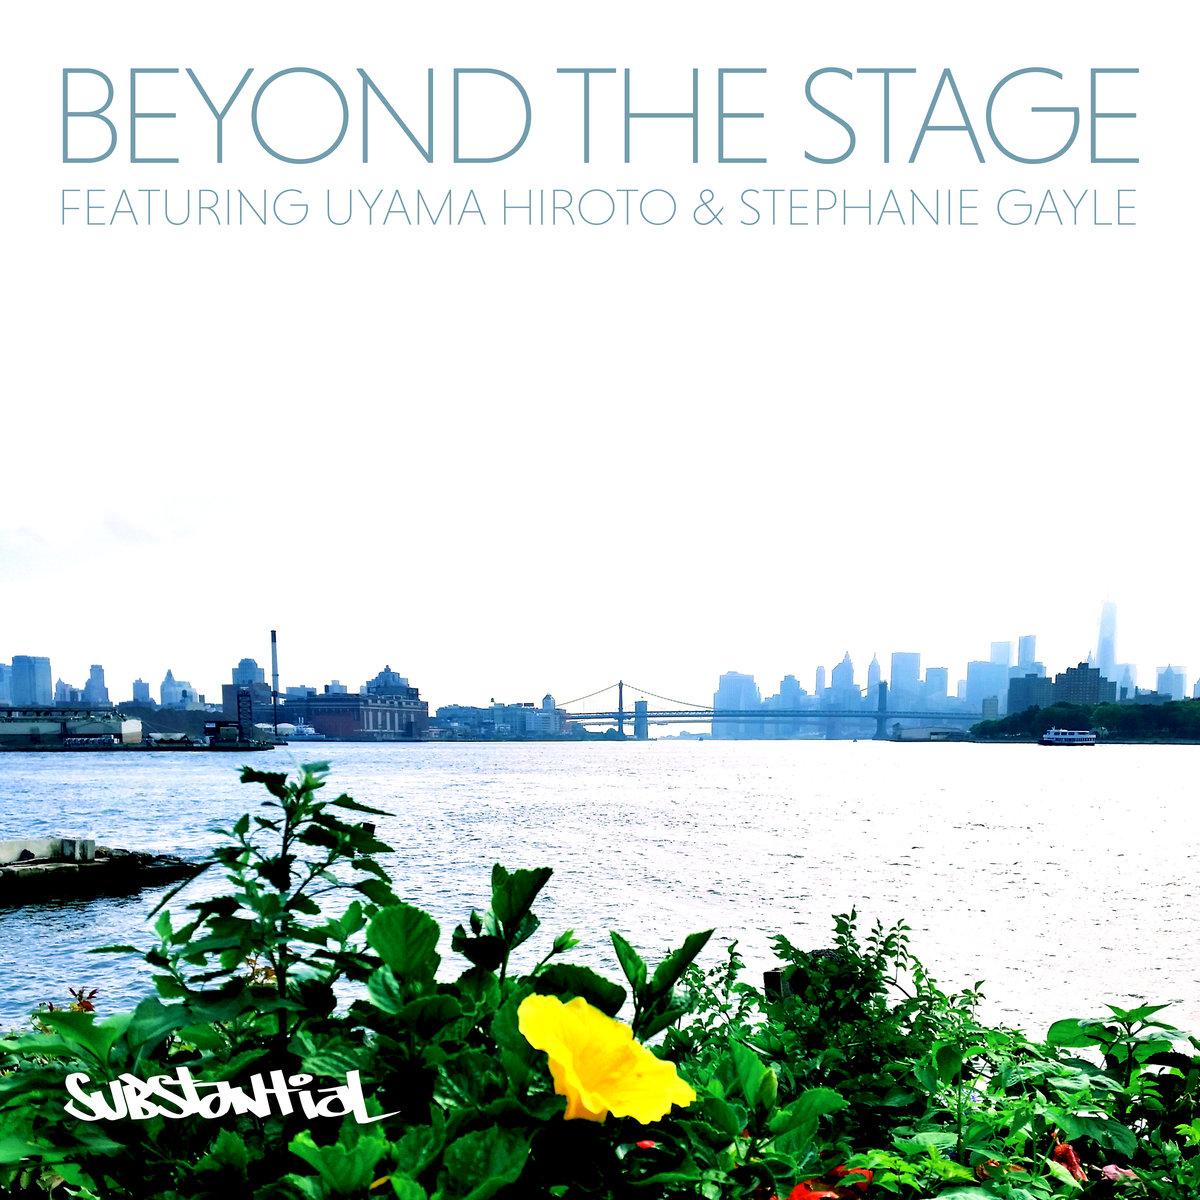 BeyondTheStage-Cover-lowres.jpg